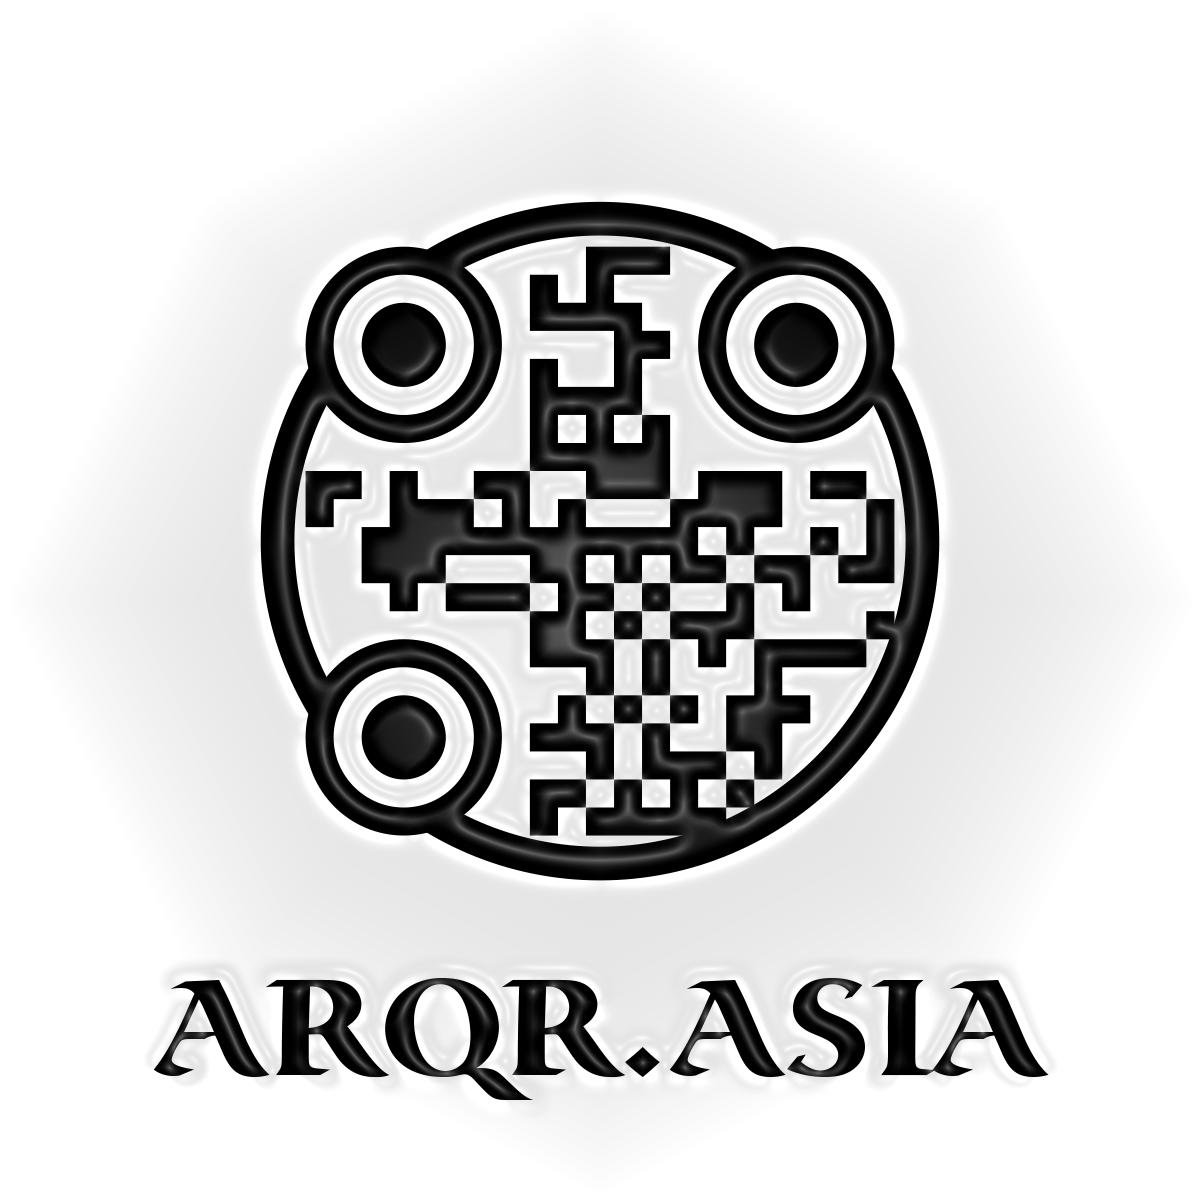 Arqr ar qr arqr code for arqria by laird marynick buycottarizona Choice Image